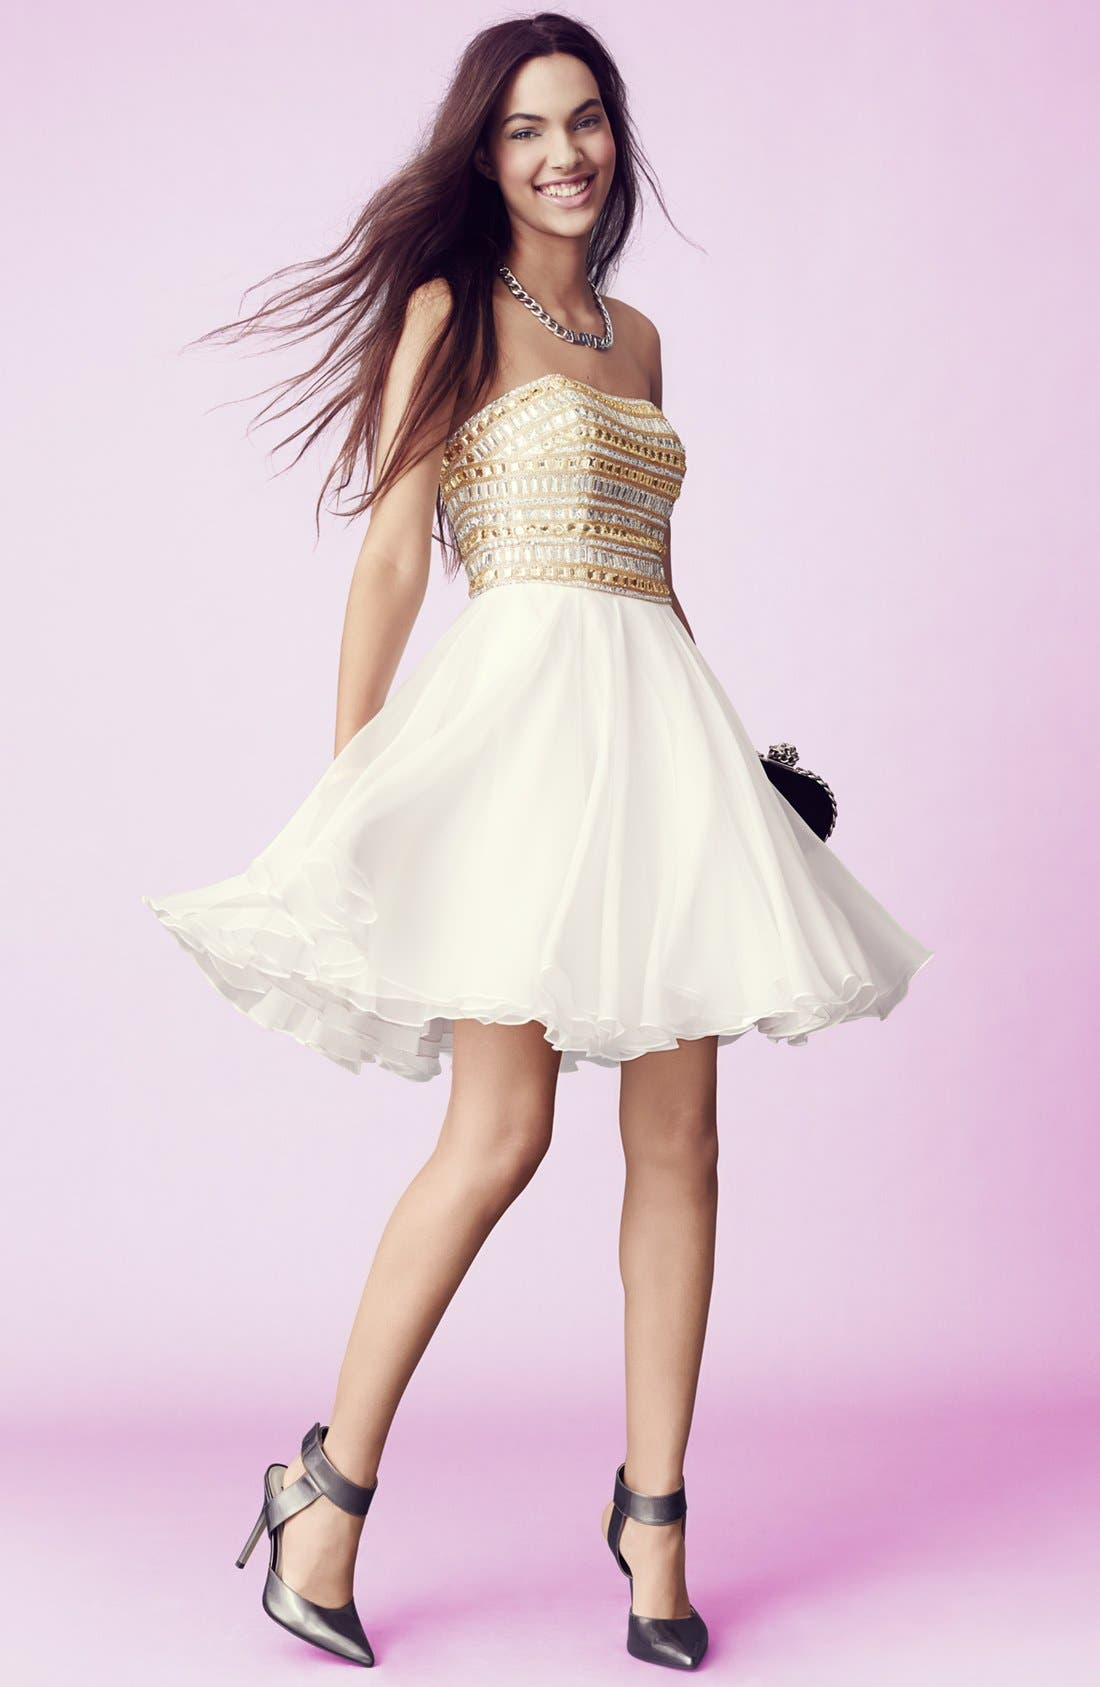 Main Image - Sherri Hill Party Dress & Accessories